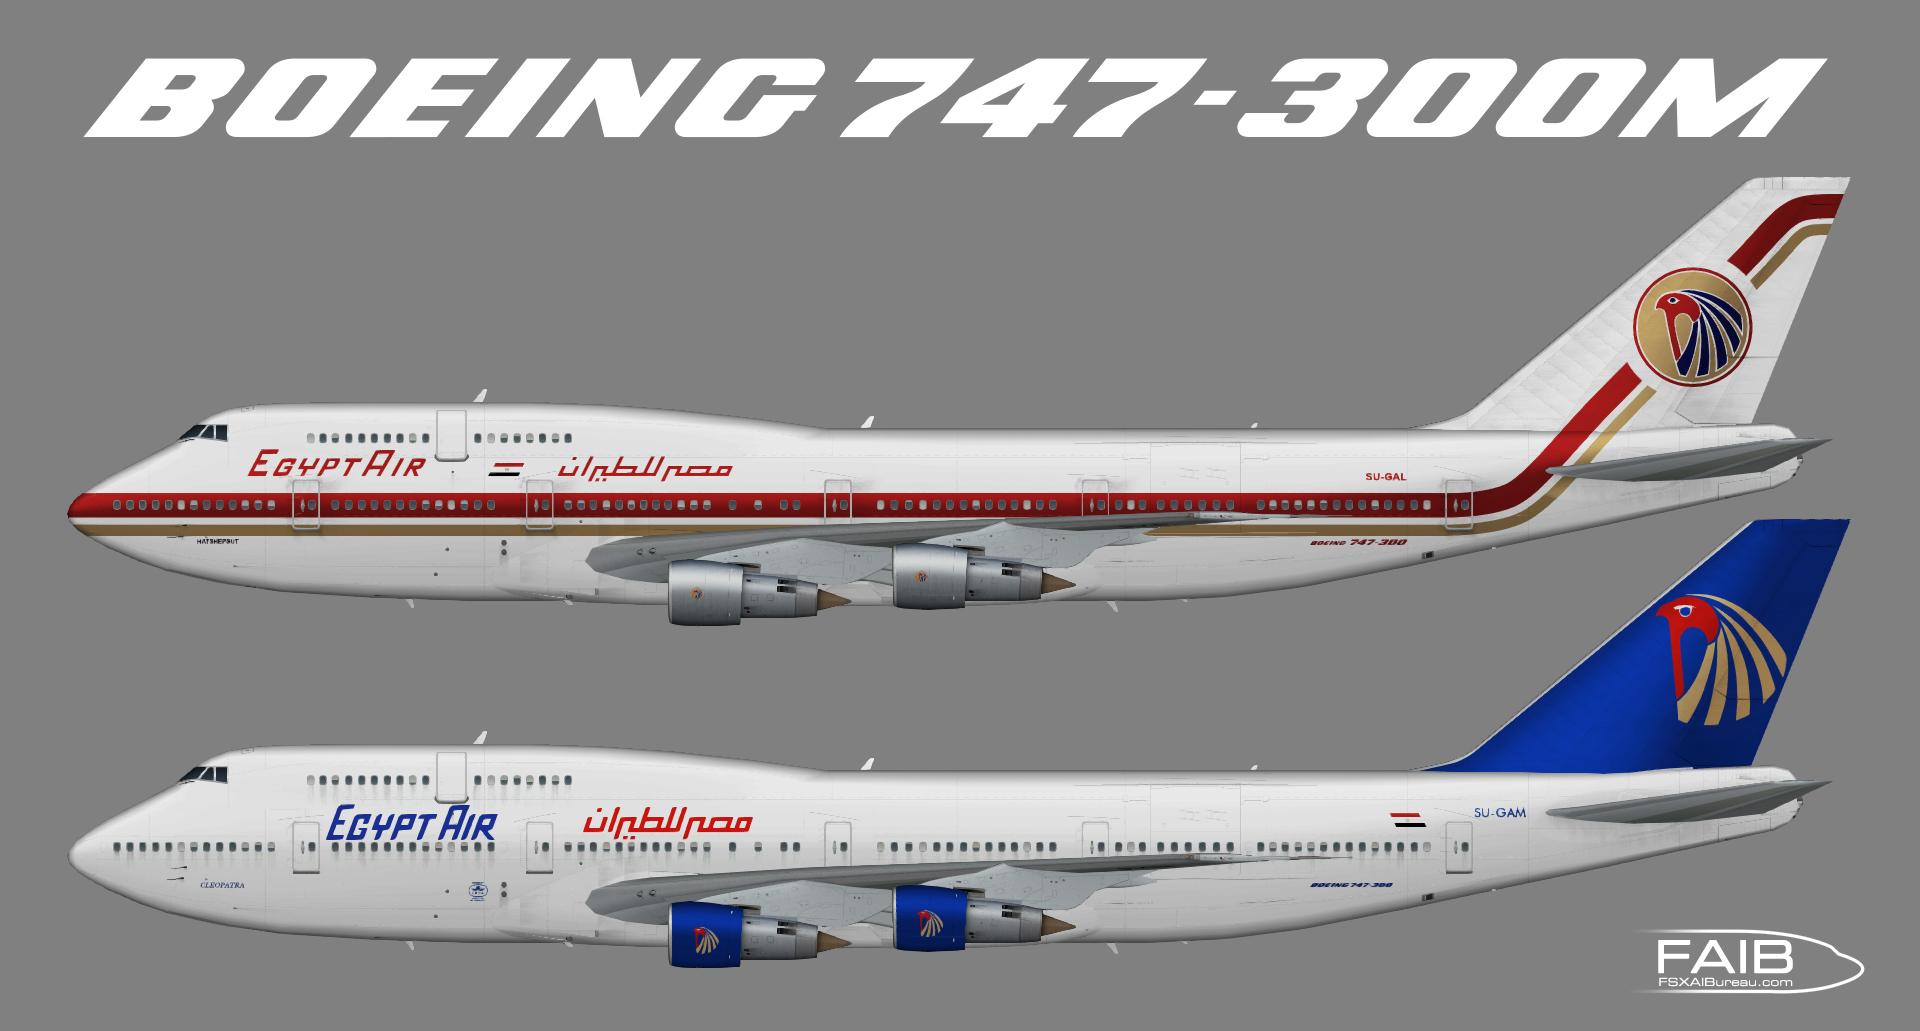 EgyptAir Boeing 747-300M